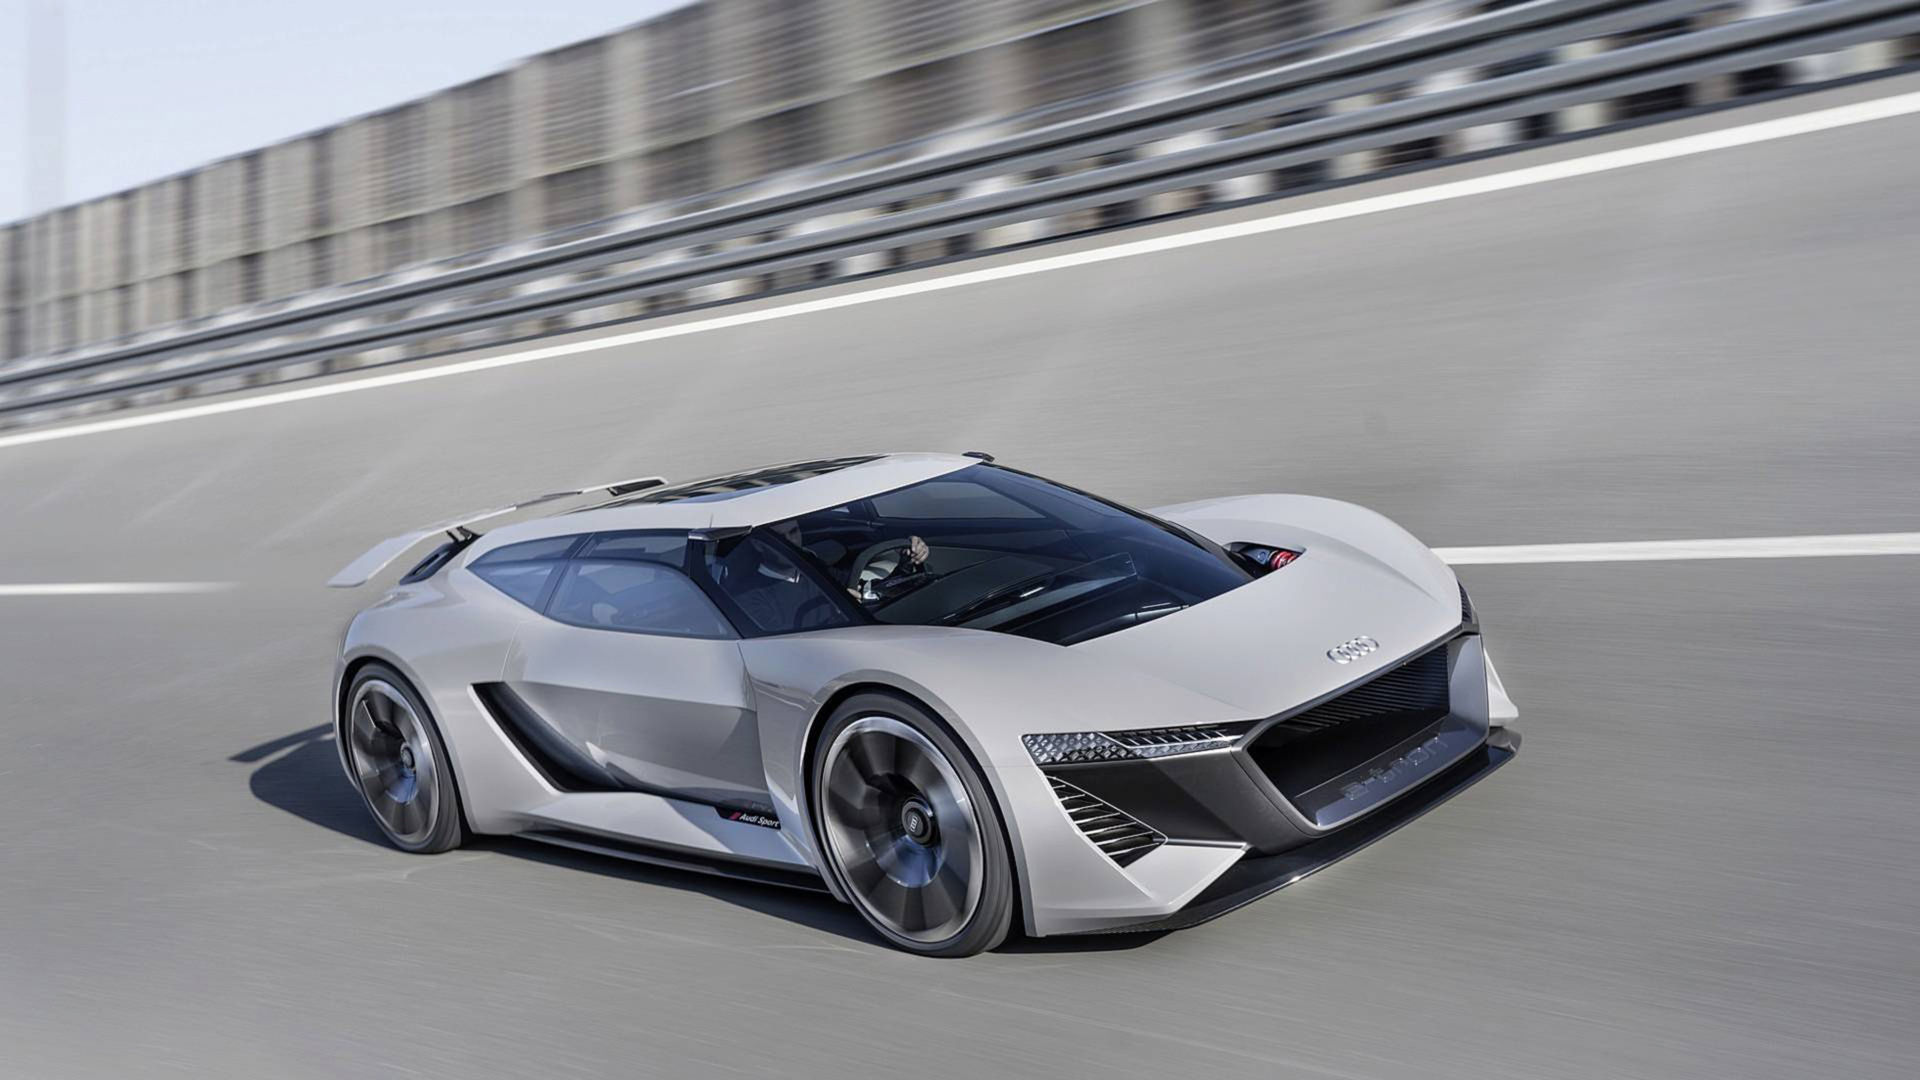 Audi rullar ut konceptbilen PB18 e-tron